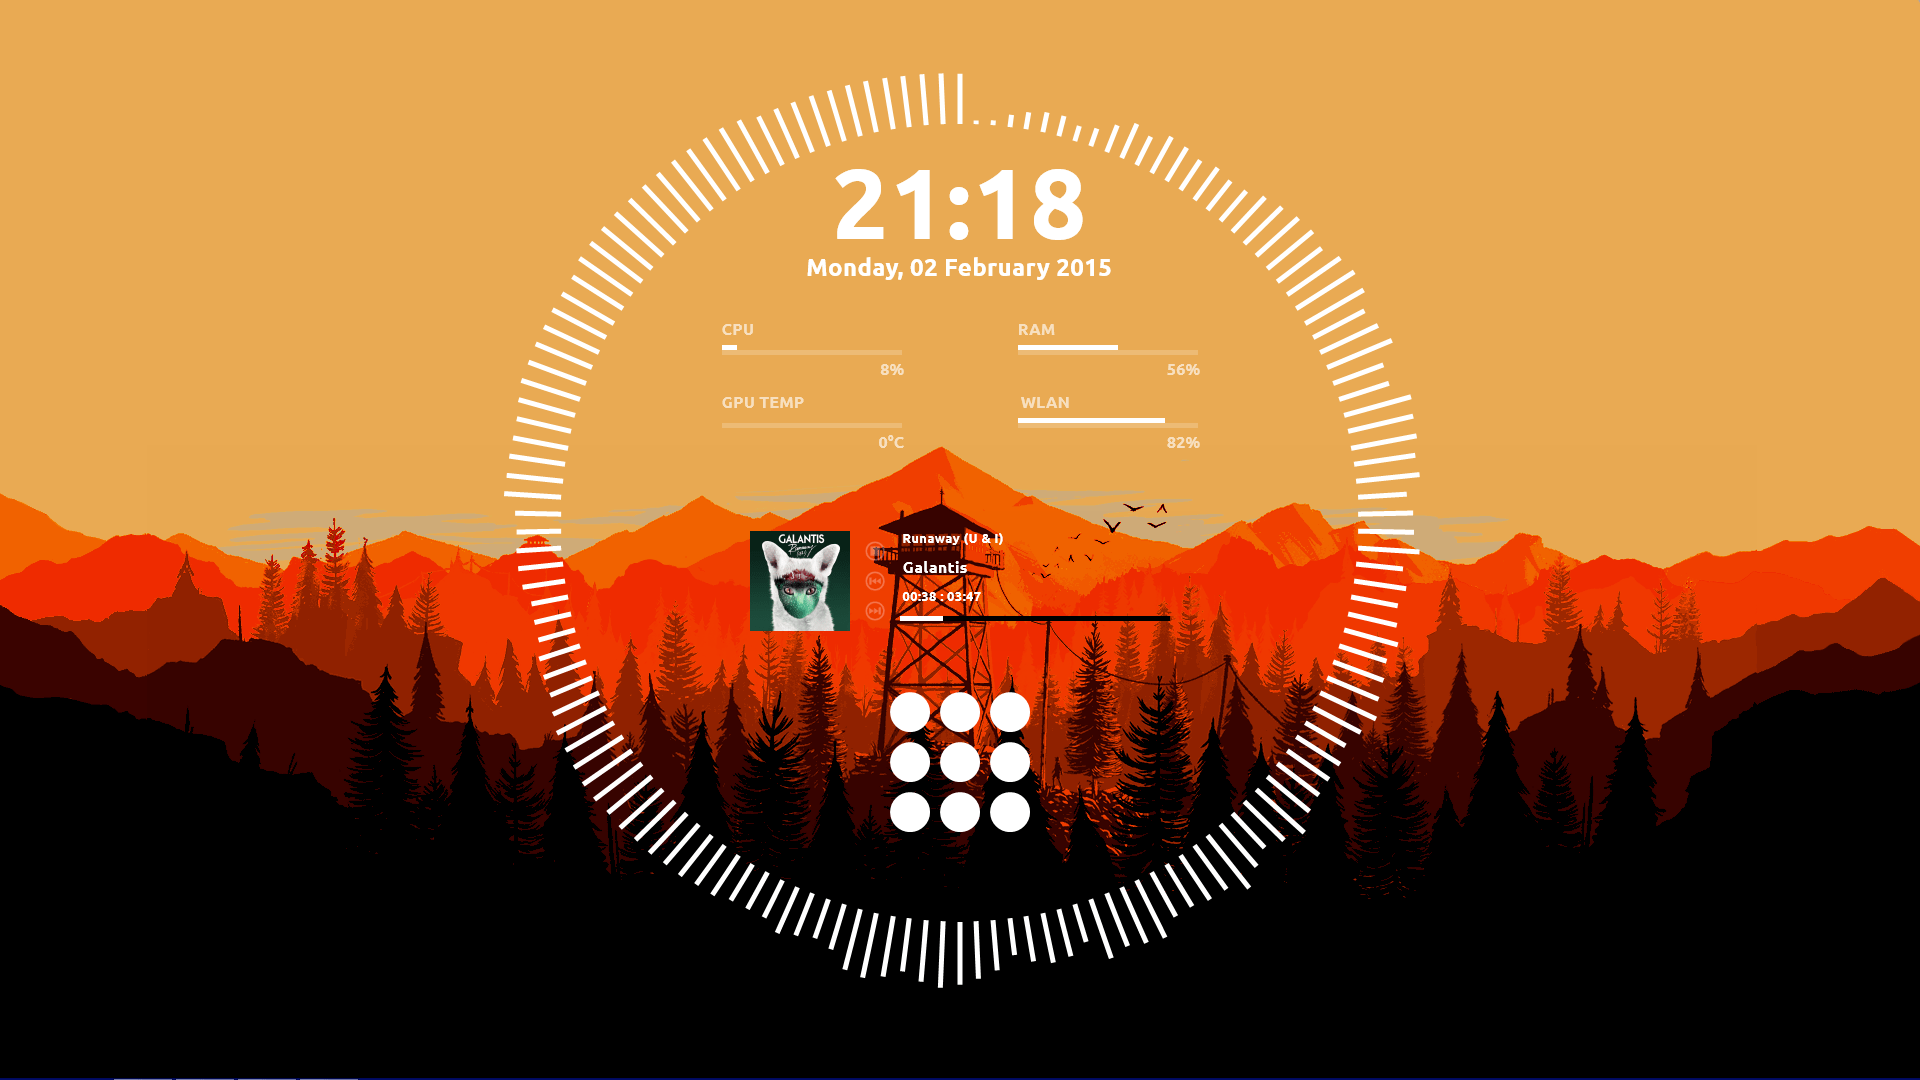 The Firewatch Desktop